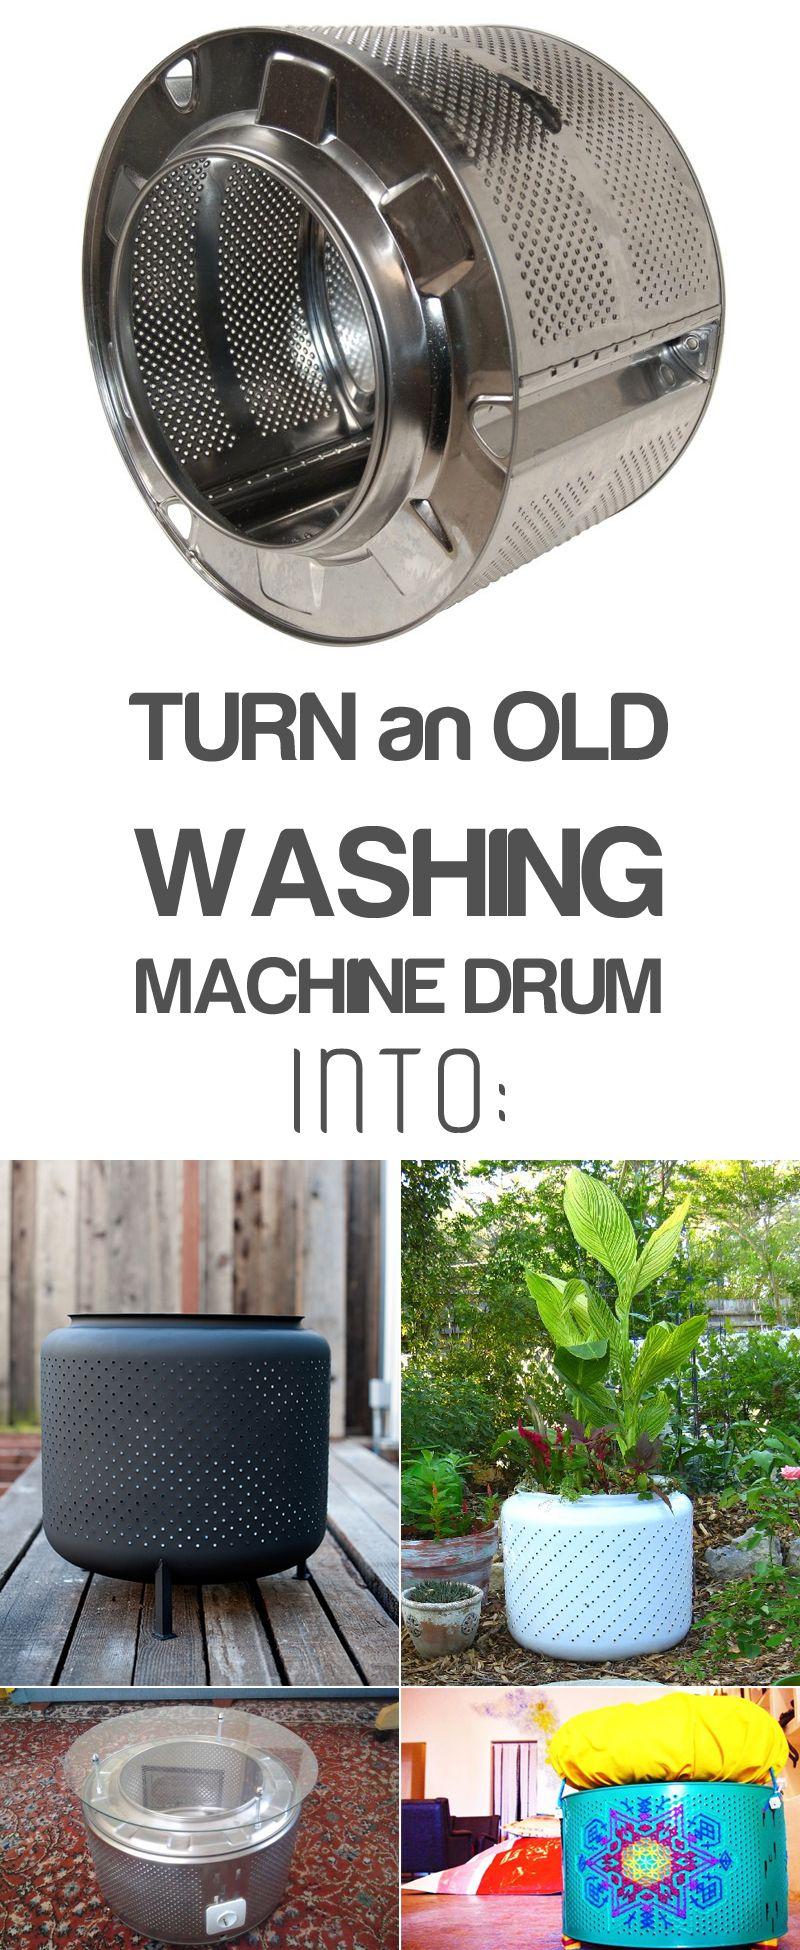 12 Creative Ways to Recycle Washing Machine Drums | Washing